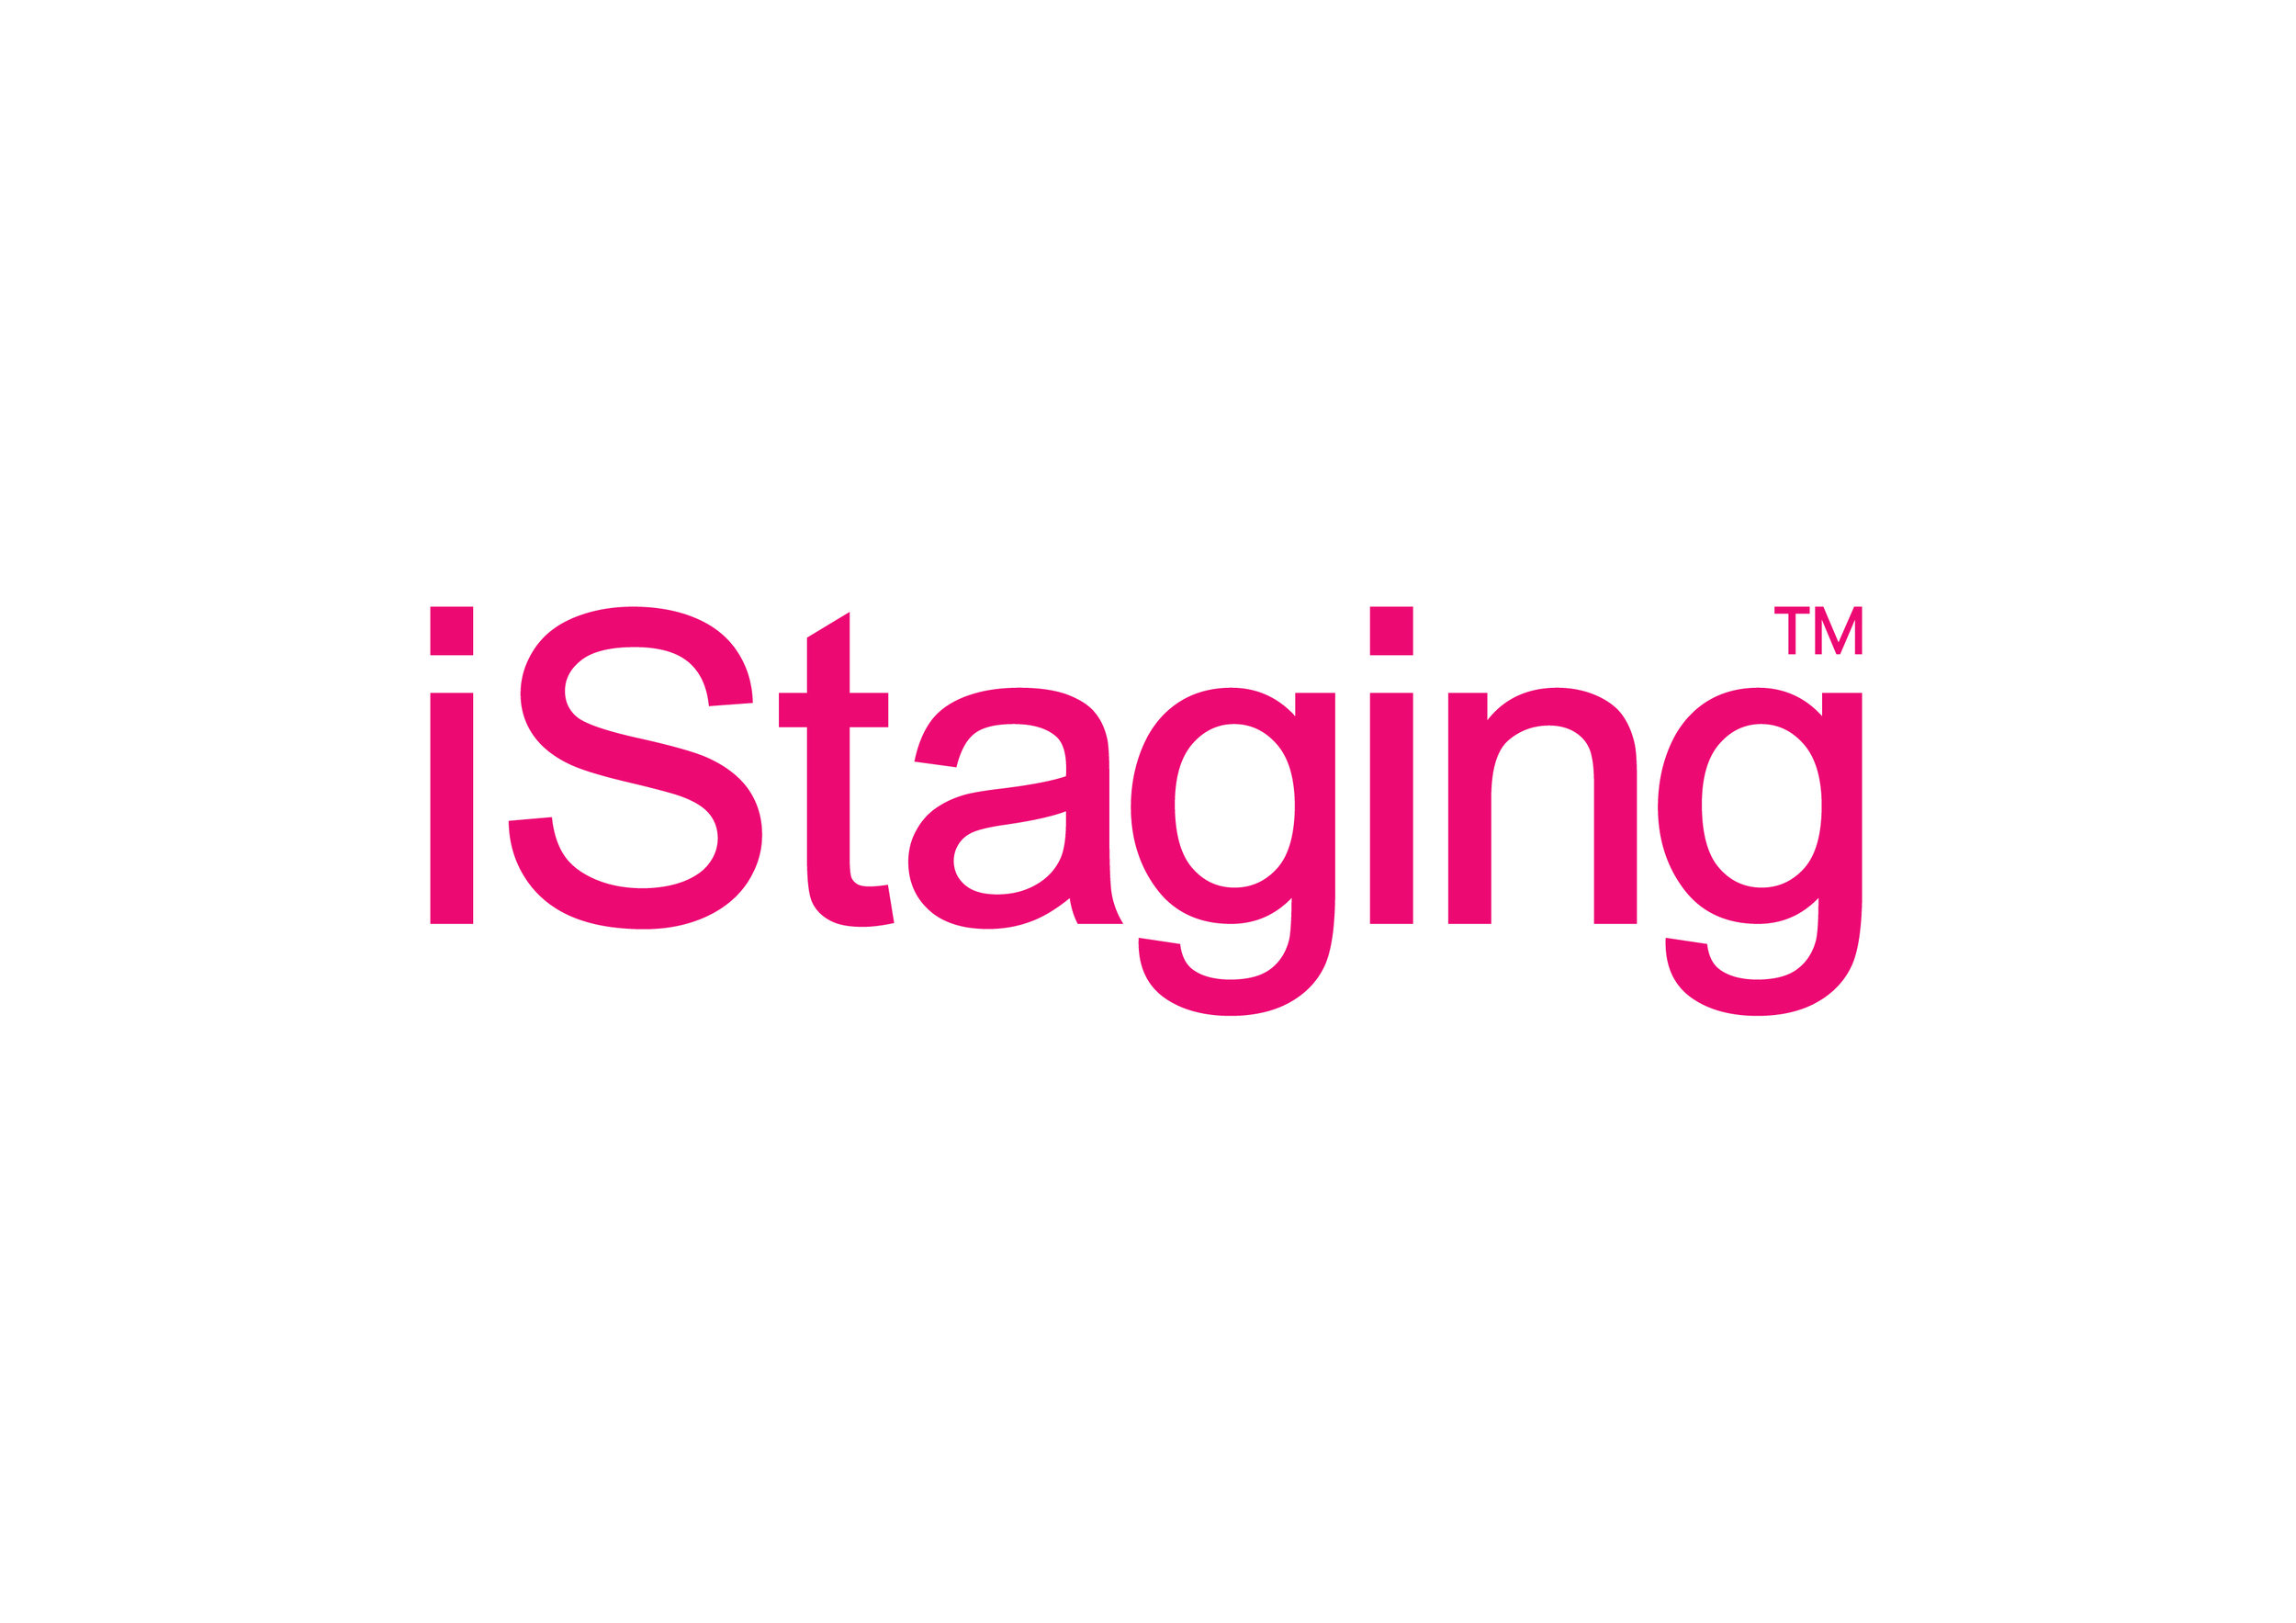 istaging_logo_pink.jpg